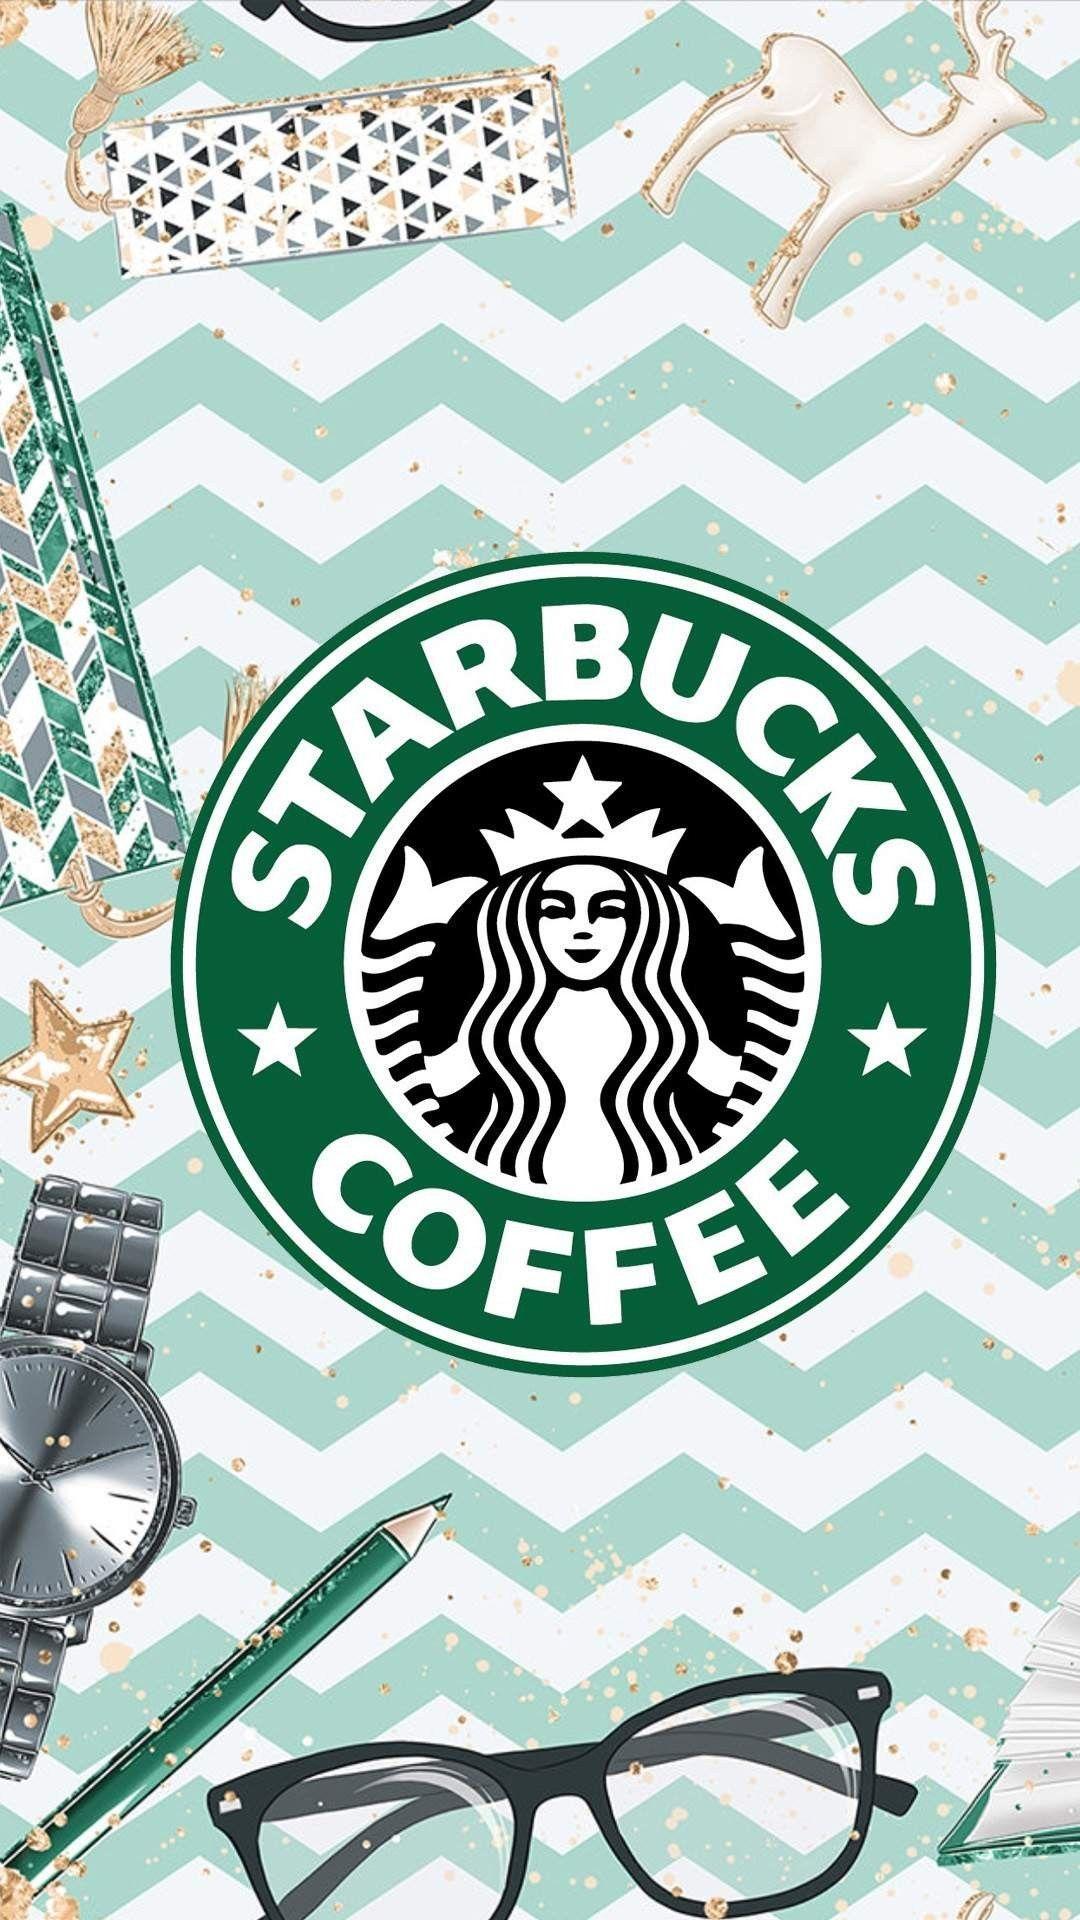 Starbucks Logo Iphone Wallpapers Top Free Starbucks Logo Iphone Backgrounds Wallpaperaccess